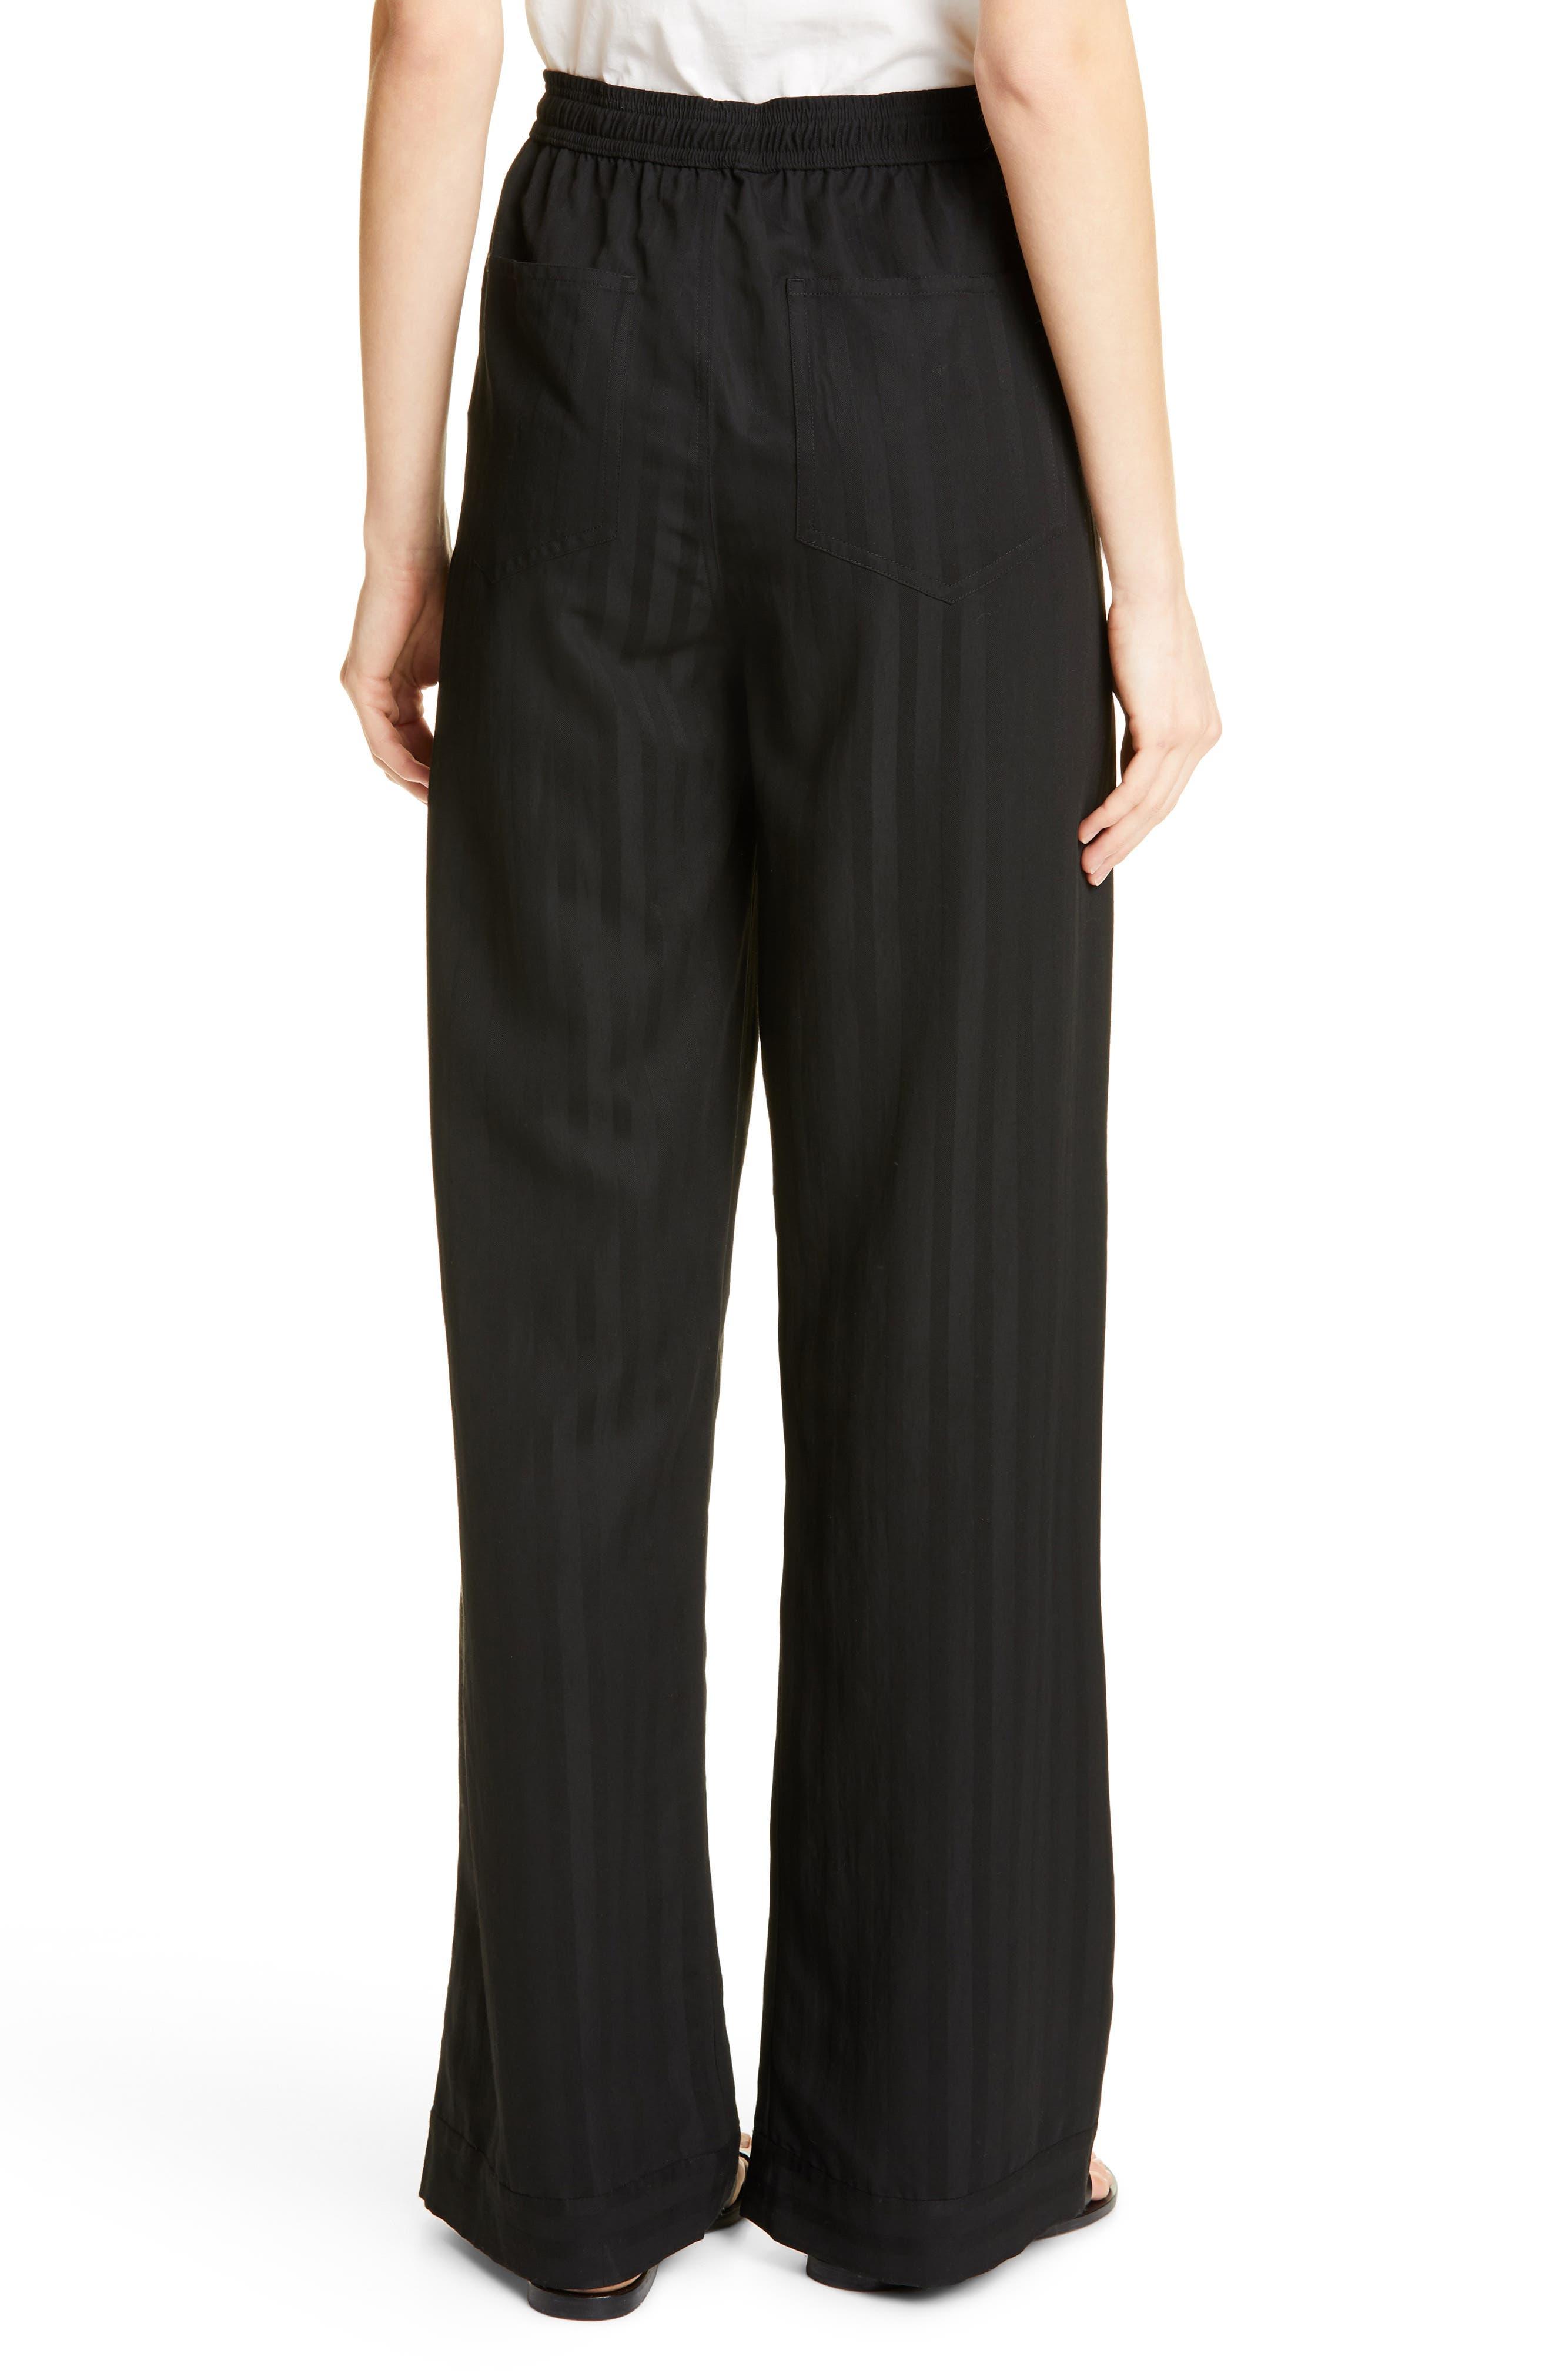 a19b5407d3766e Women's Polo Ralph Lauren Pants & Leggings   Nordstrom